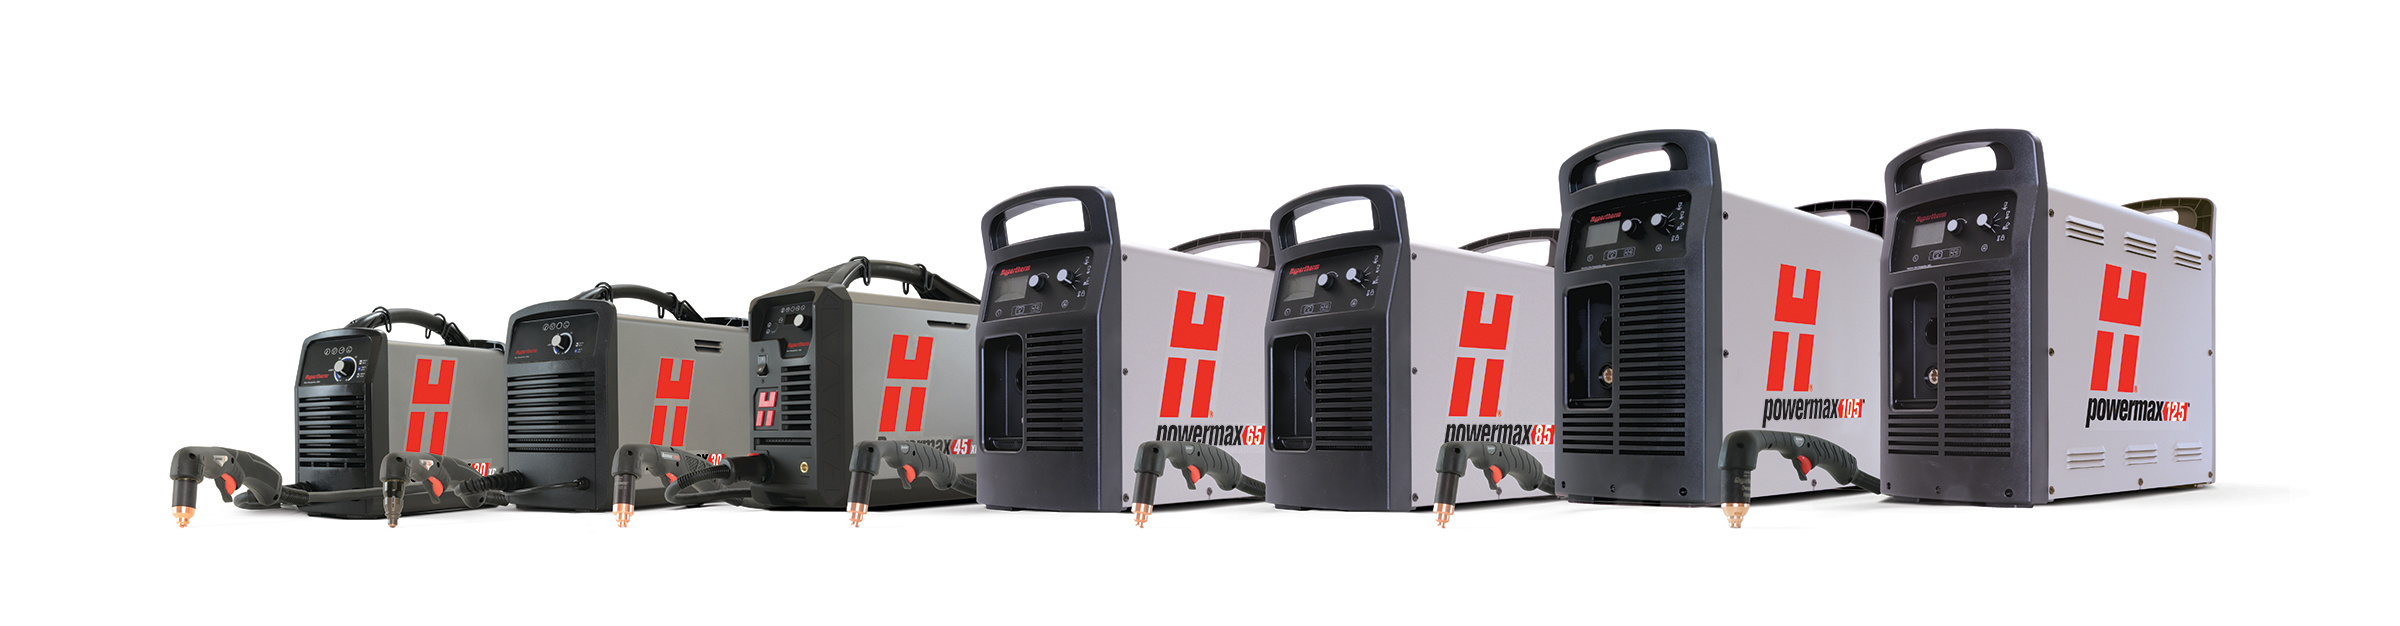 Hypertherm Powermax Family